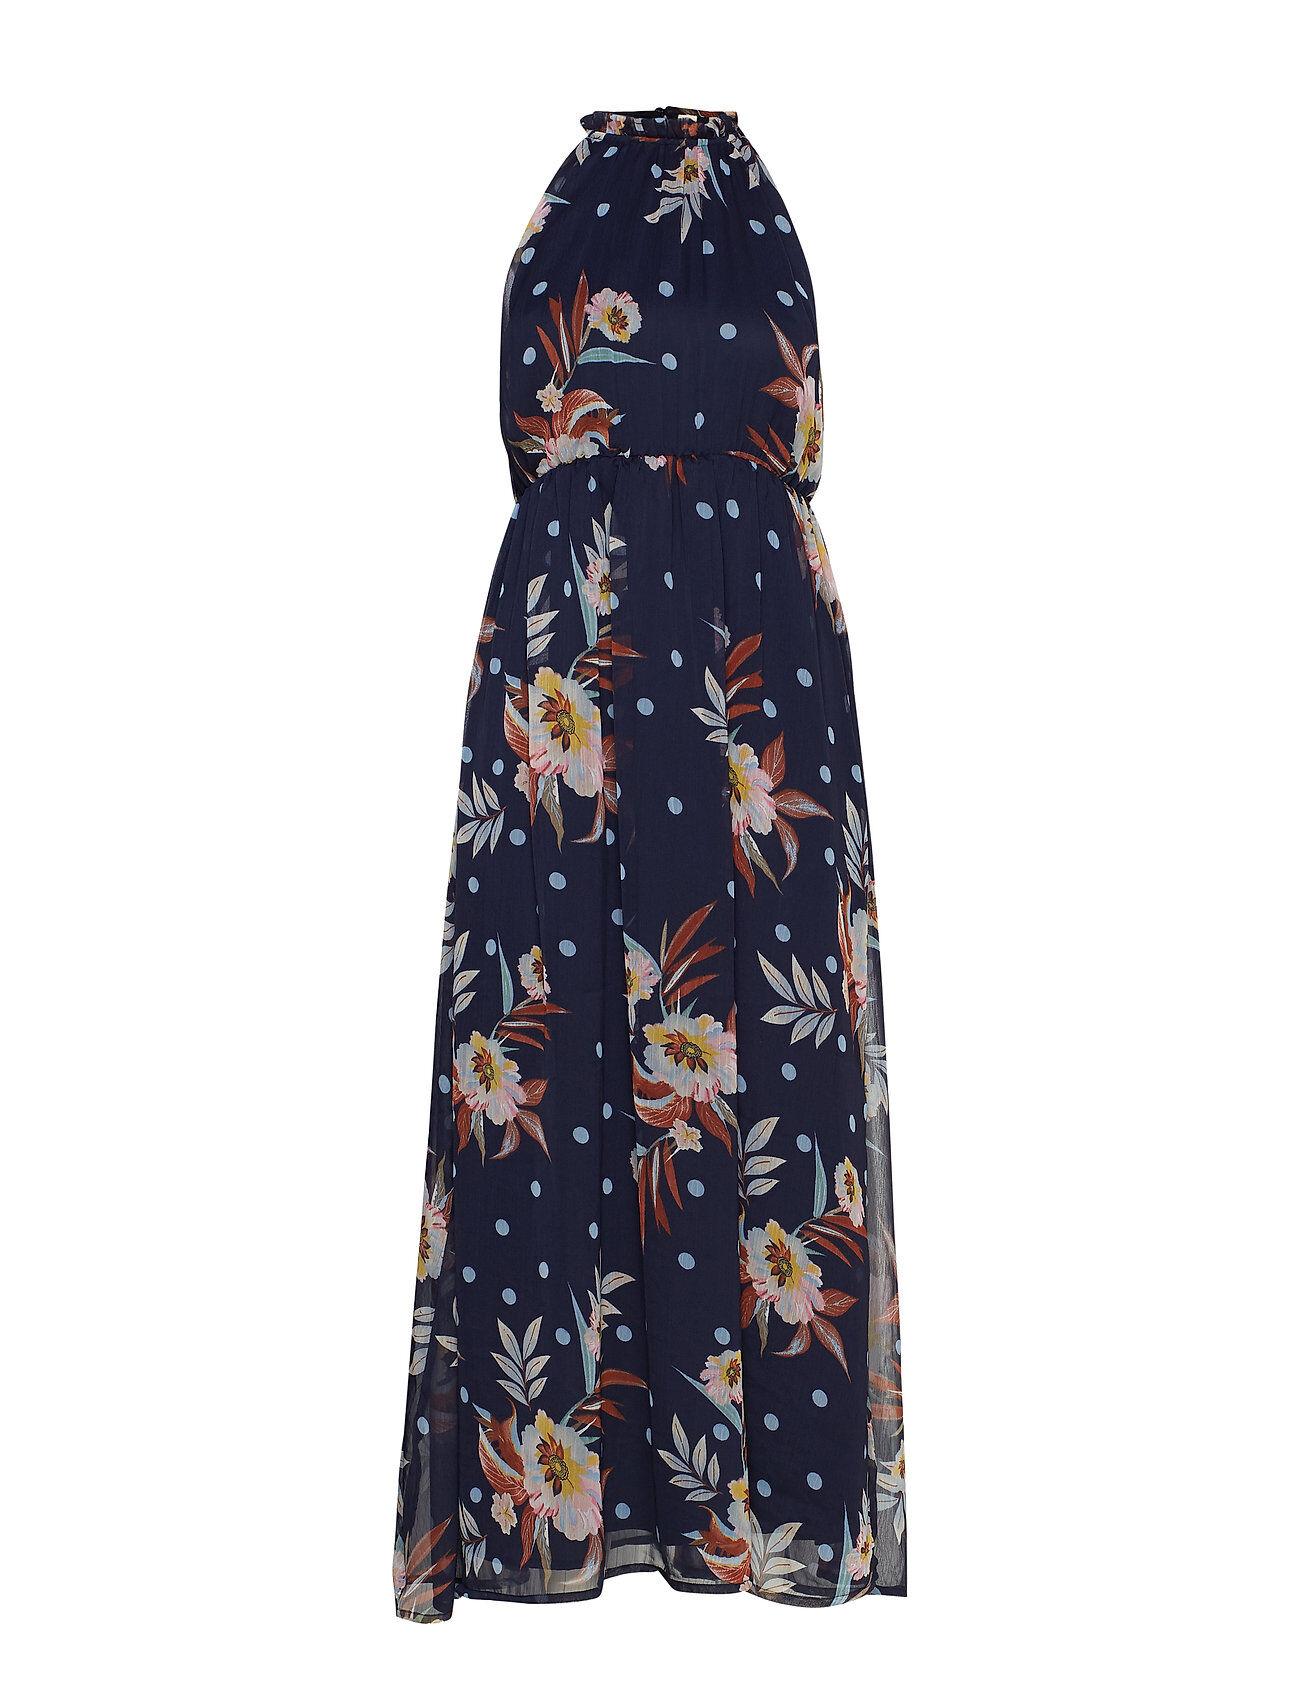 Image of Yassolira Chiffon Maxi Dress - Da Maksimekko Juhlamekko Sininen YAS